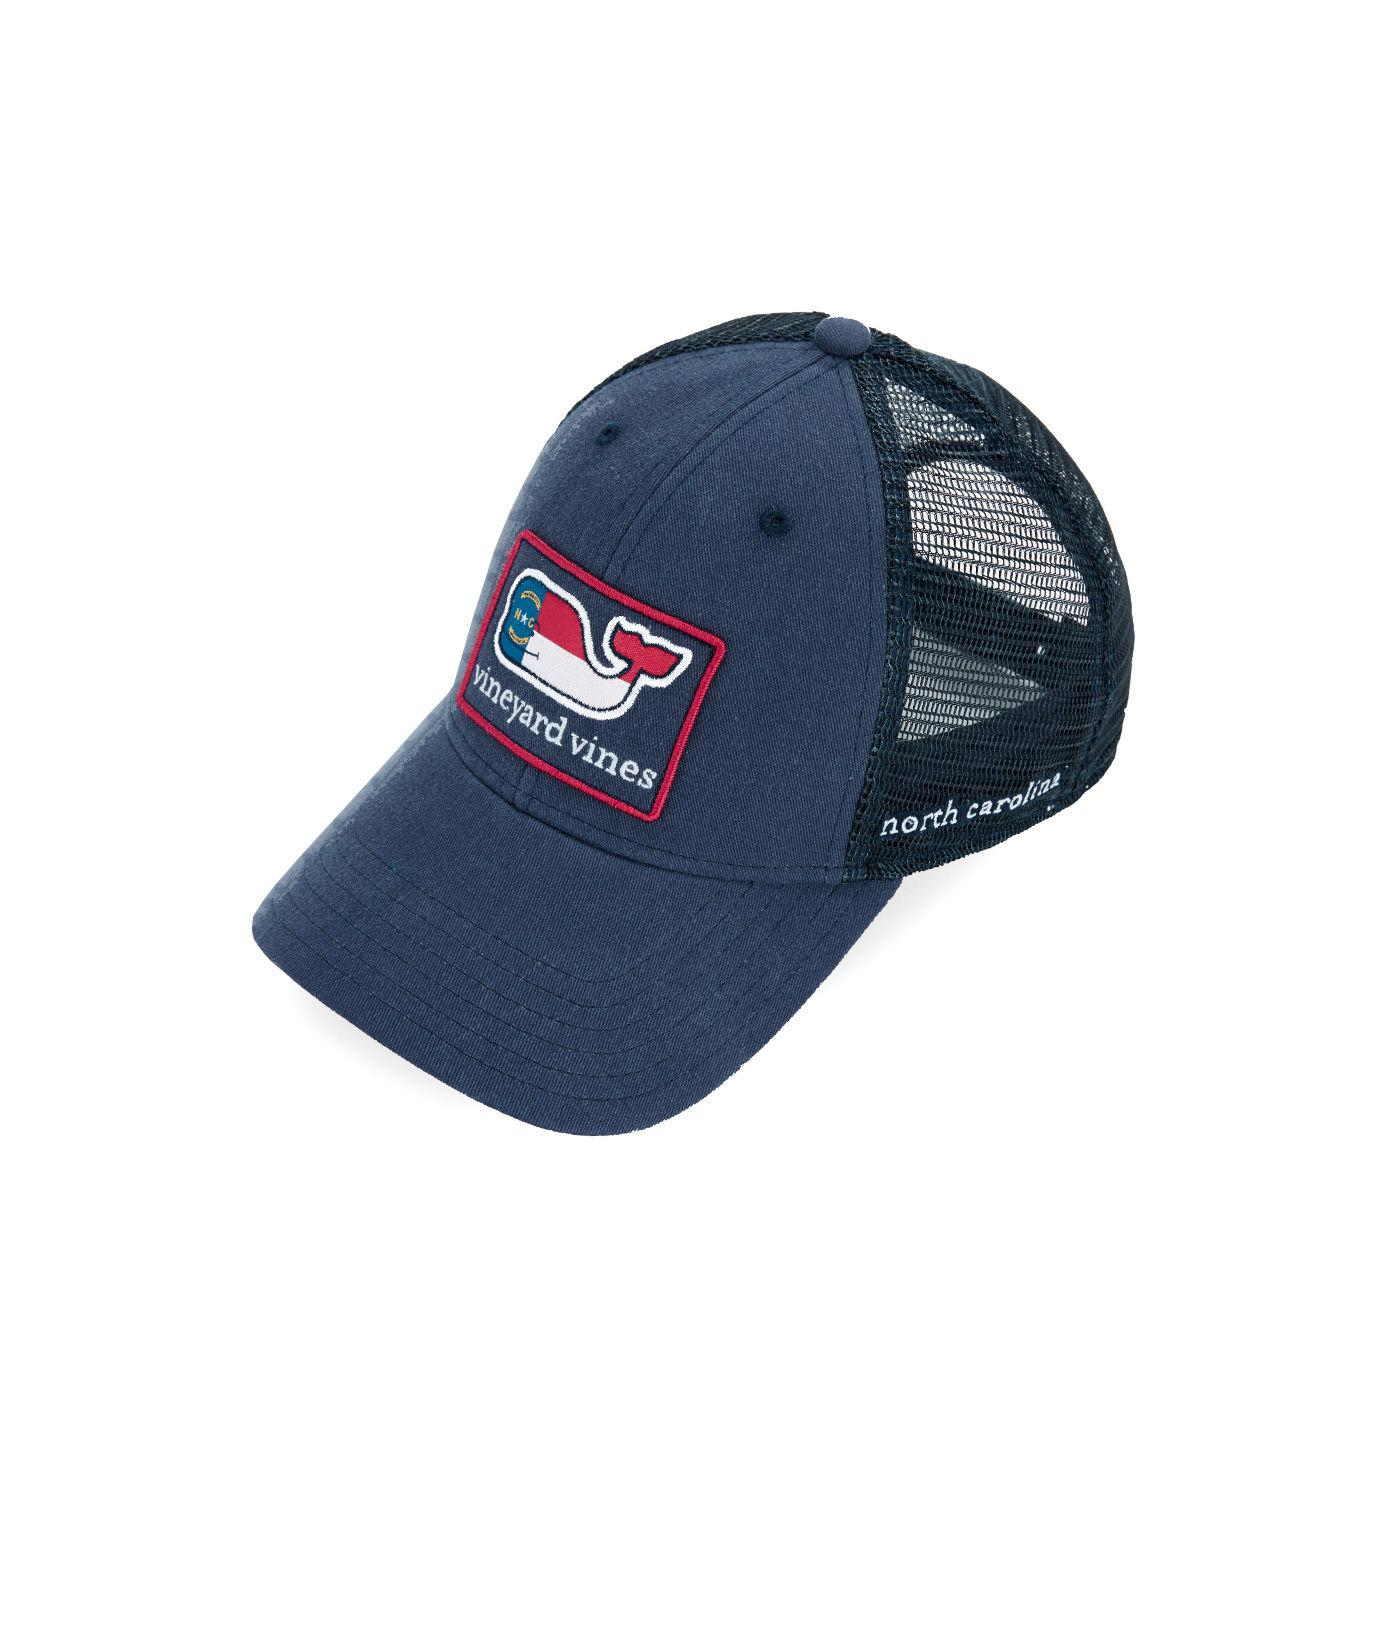 e844b838 Vineyard Vines North Carolina Icon Trucker Hat in Blue for Men - Lyst